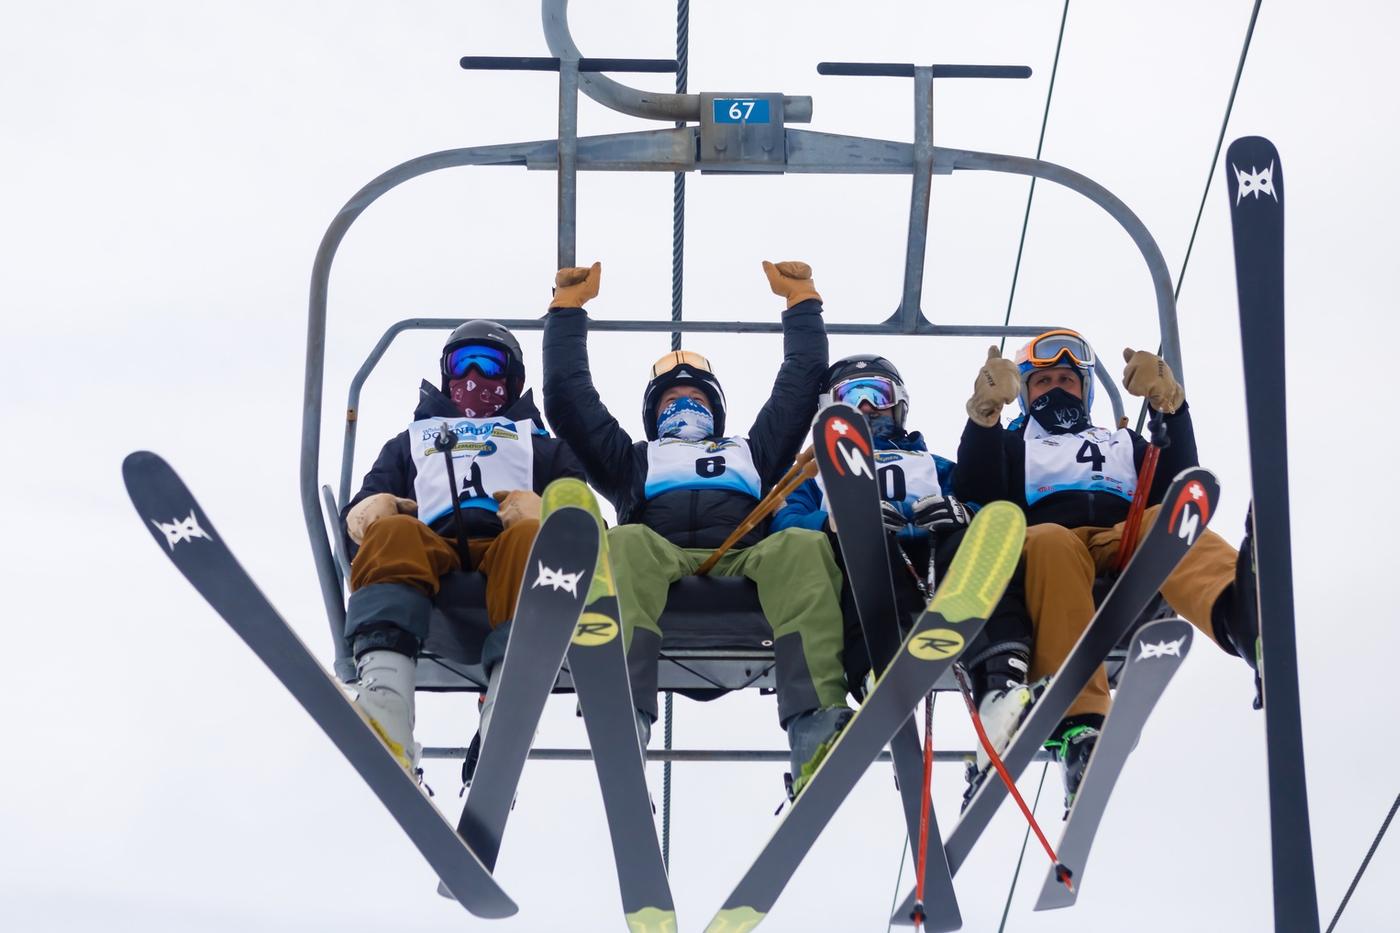 WinterKids Downhill 24 2021 SDP 2793